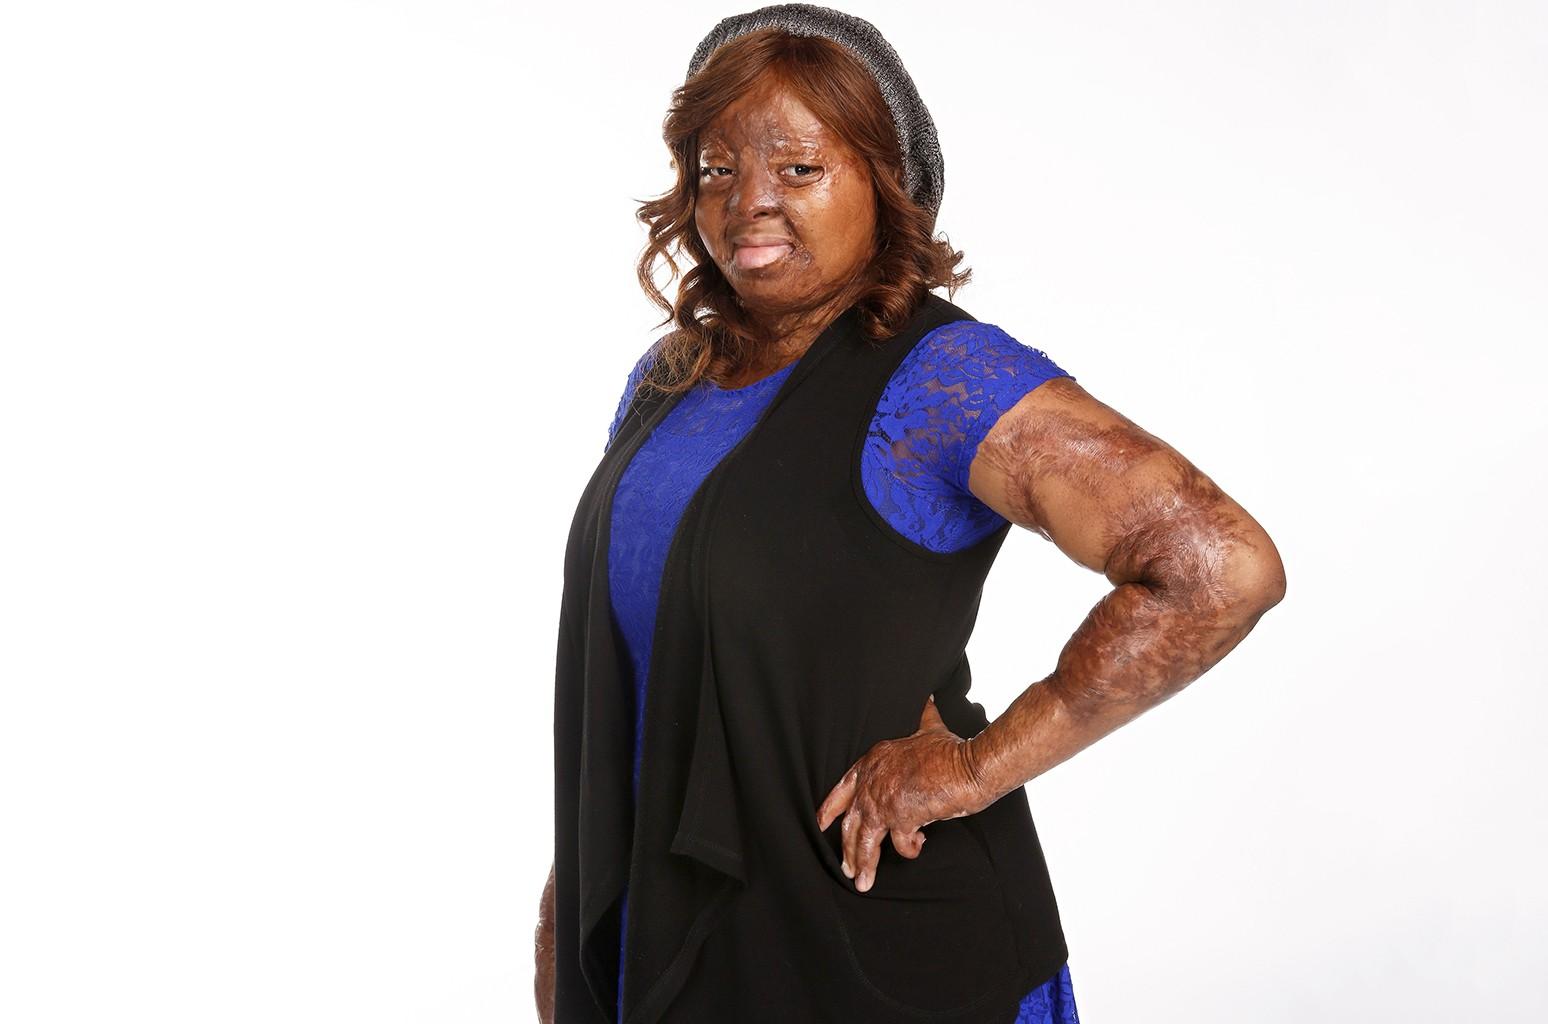 Kechi Okwuchi in a portrait for America's Got Talent.